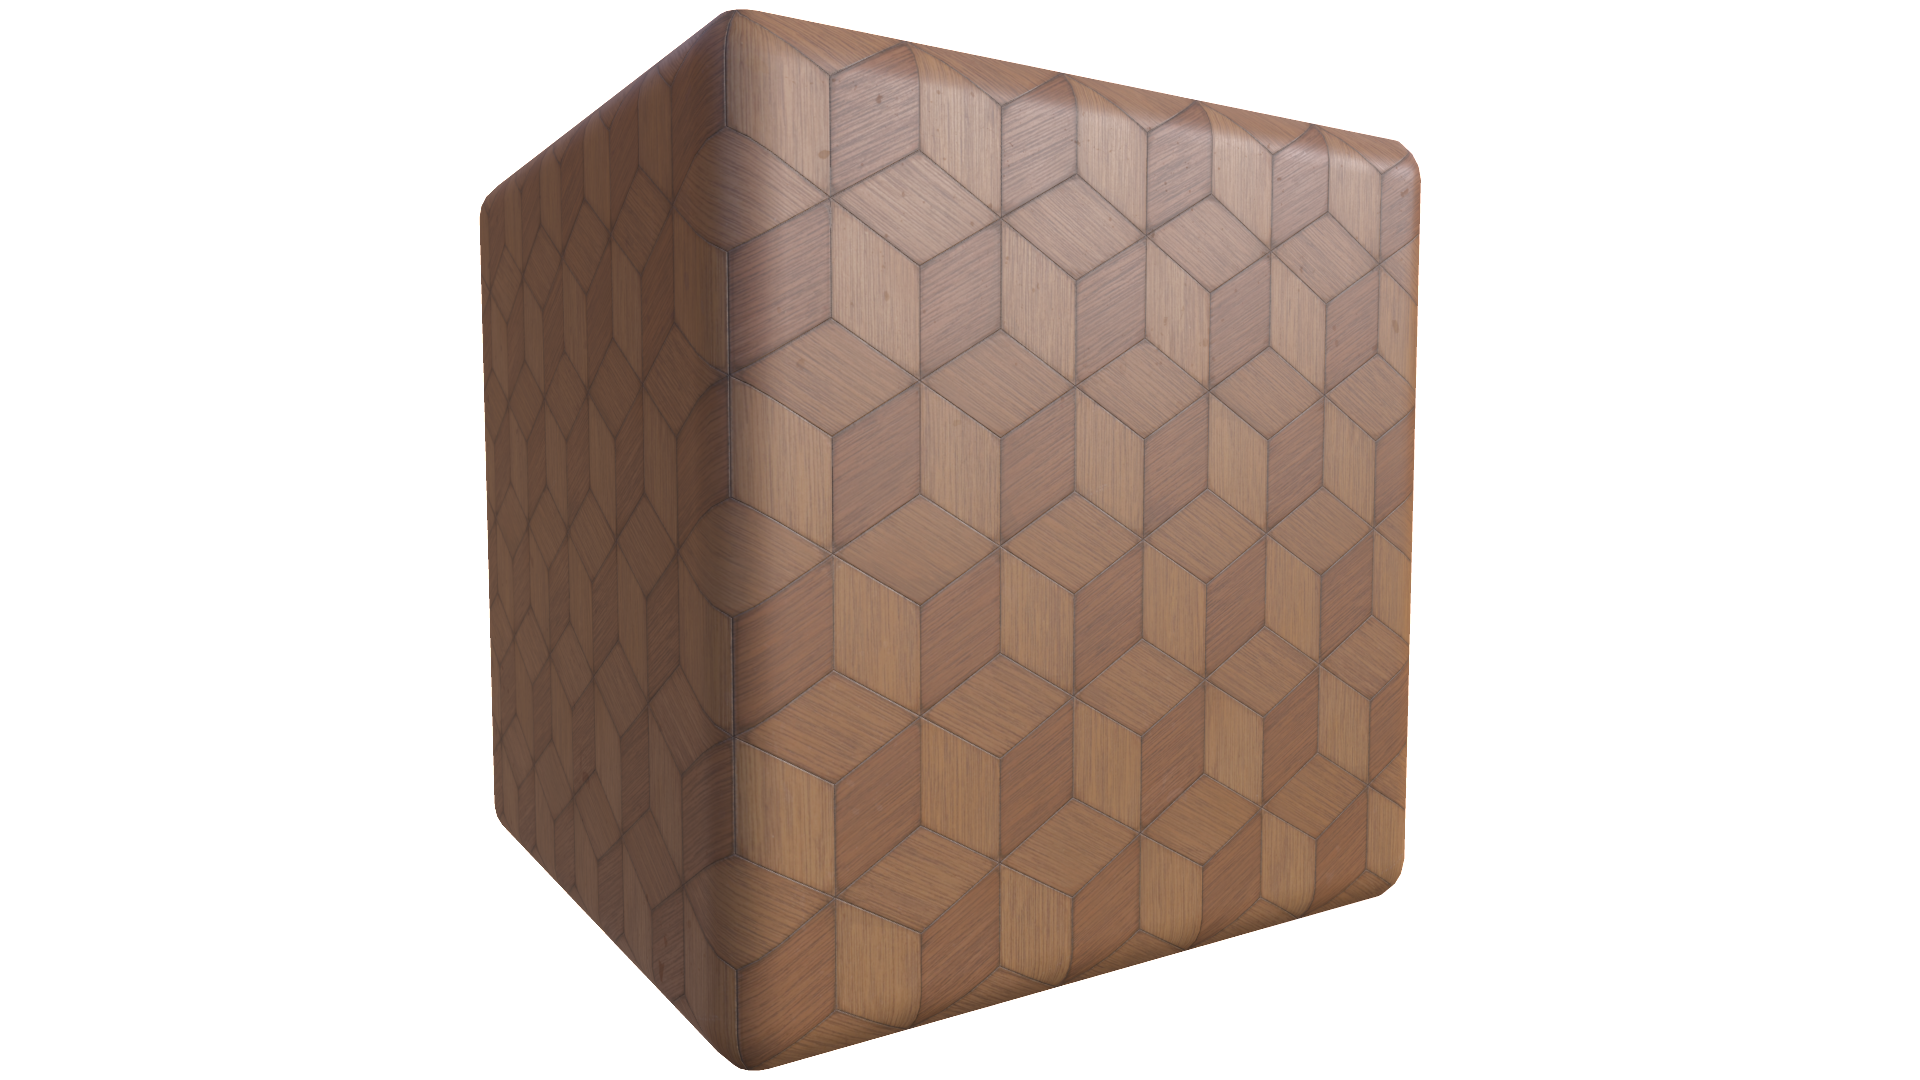 Diamond Wood Floor Tiles PBR Texture from